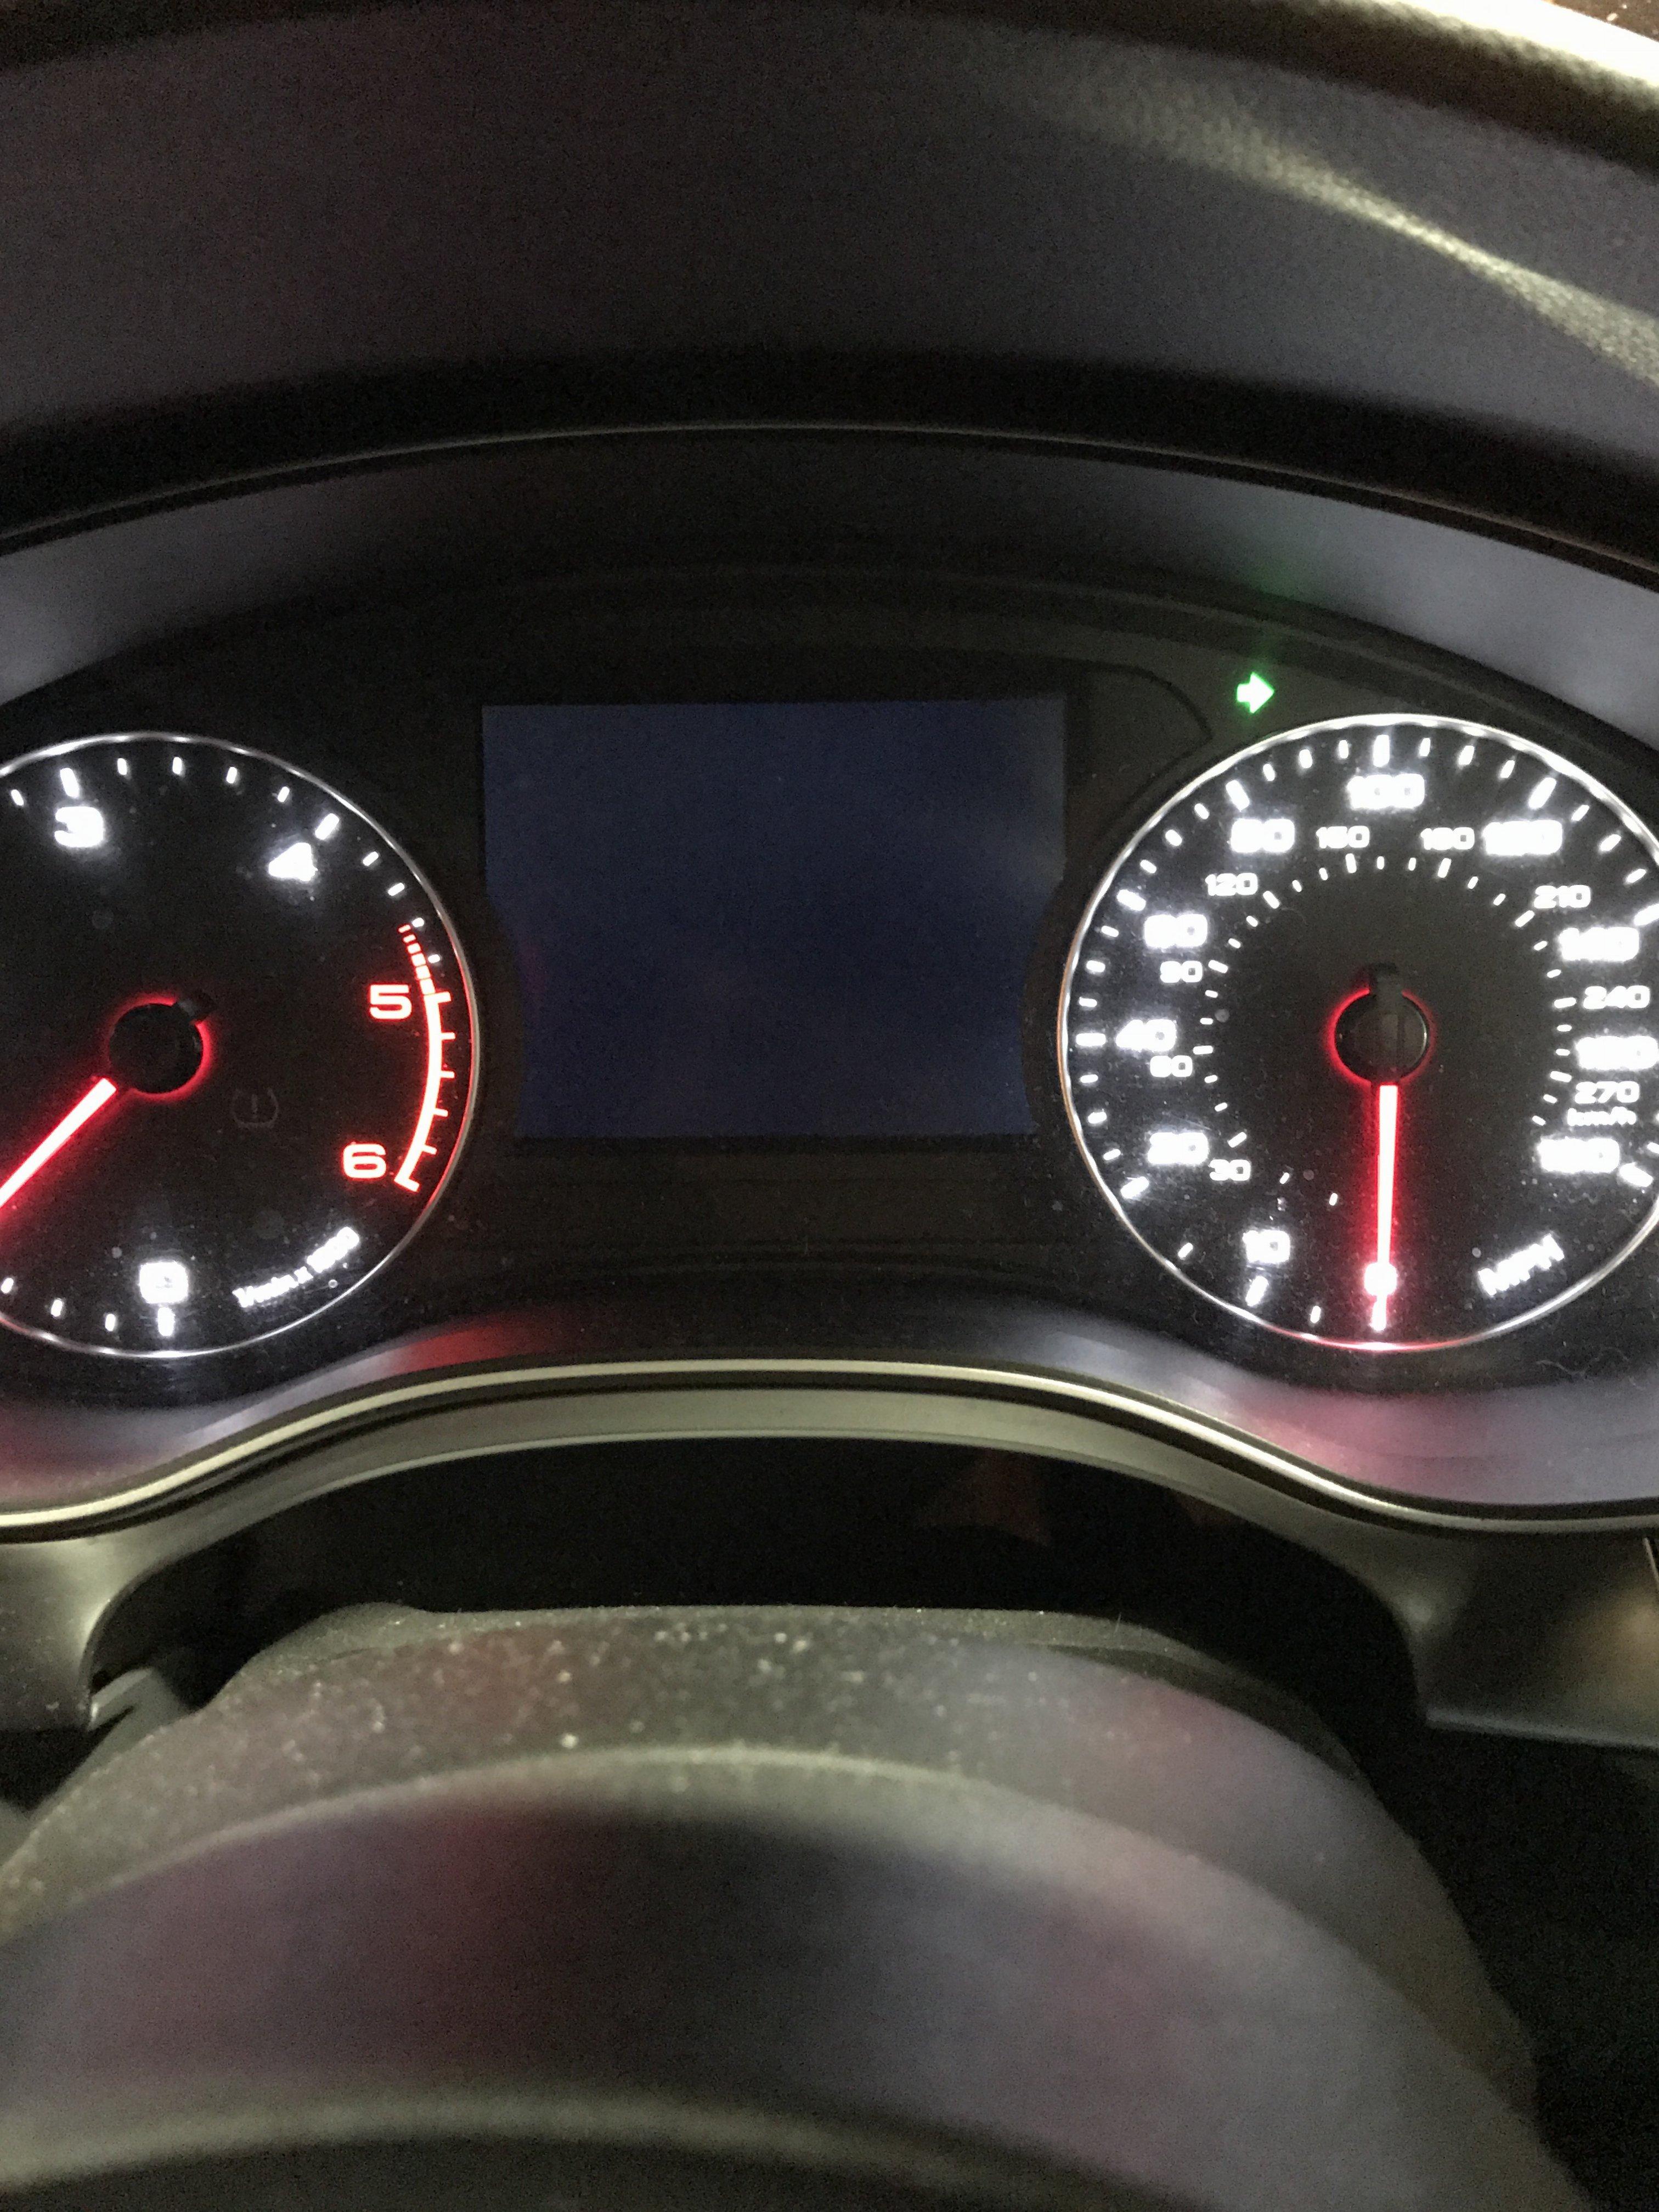 Display blank? A6 c7 | Audi-Sport net